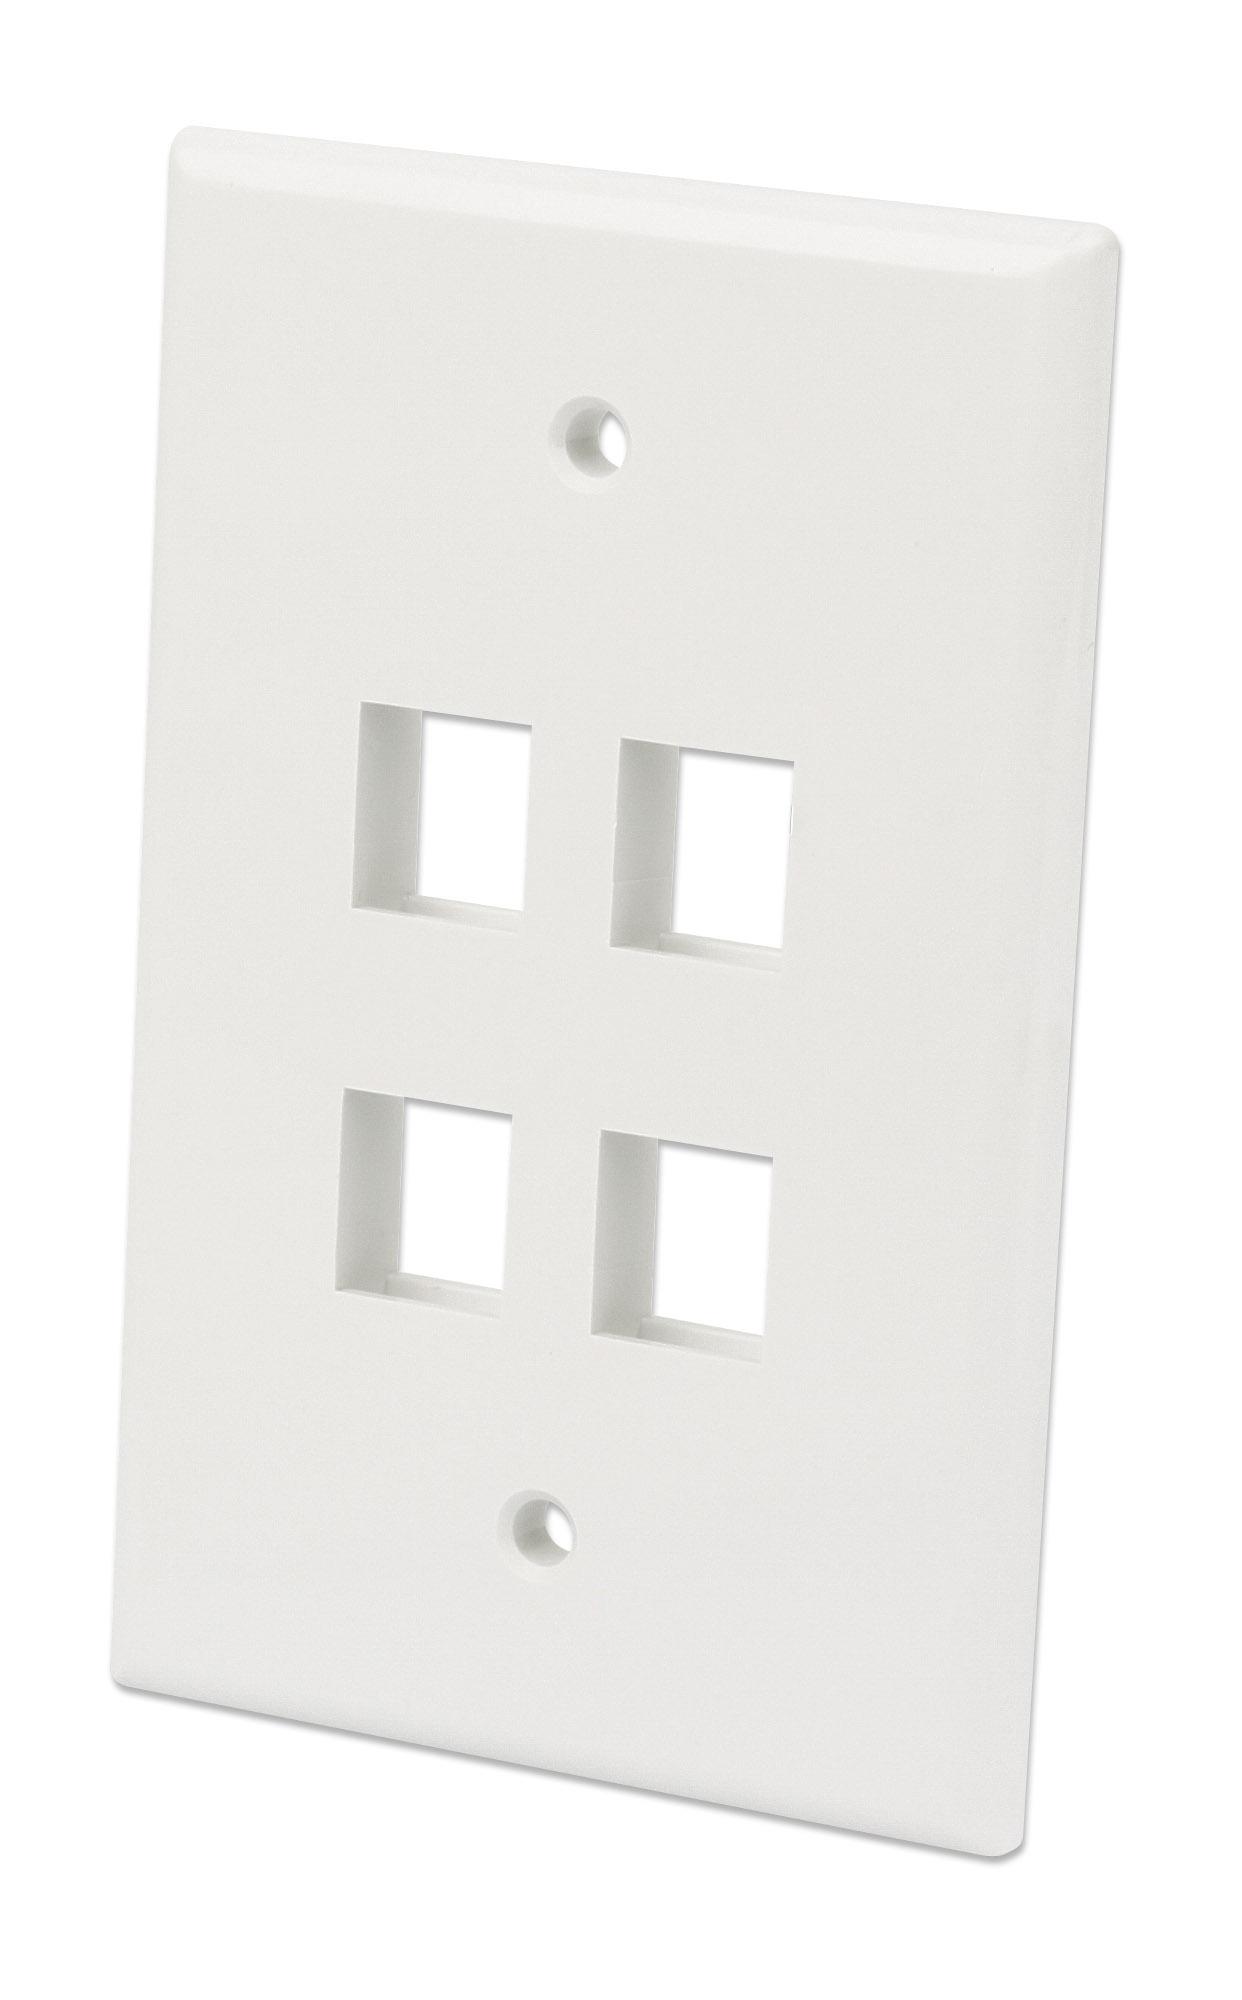 4-Outlet Oversized Keystone Wall Plate